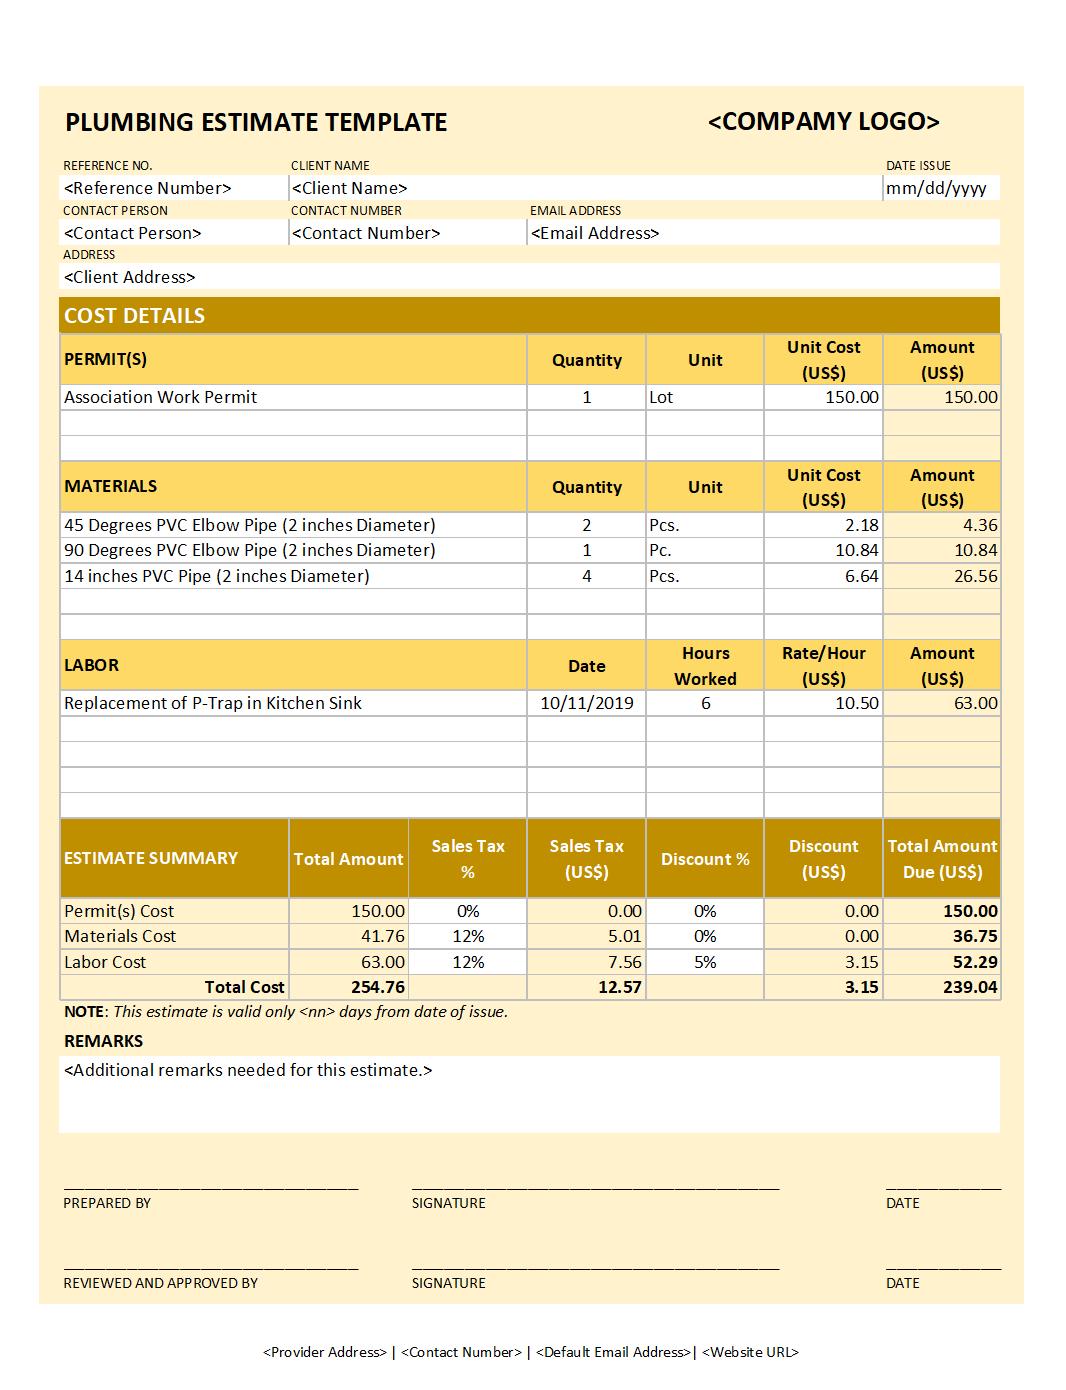 Free Plumbing Estimate Template v2